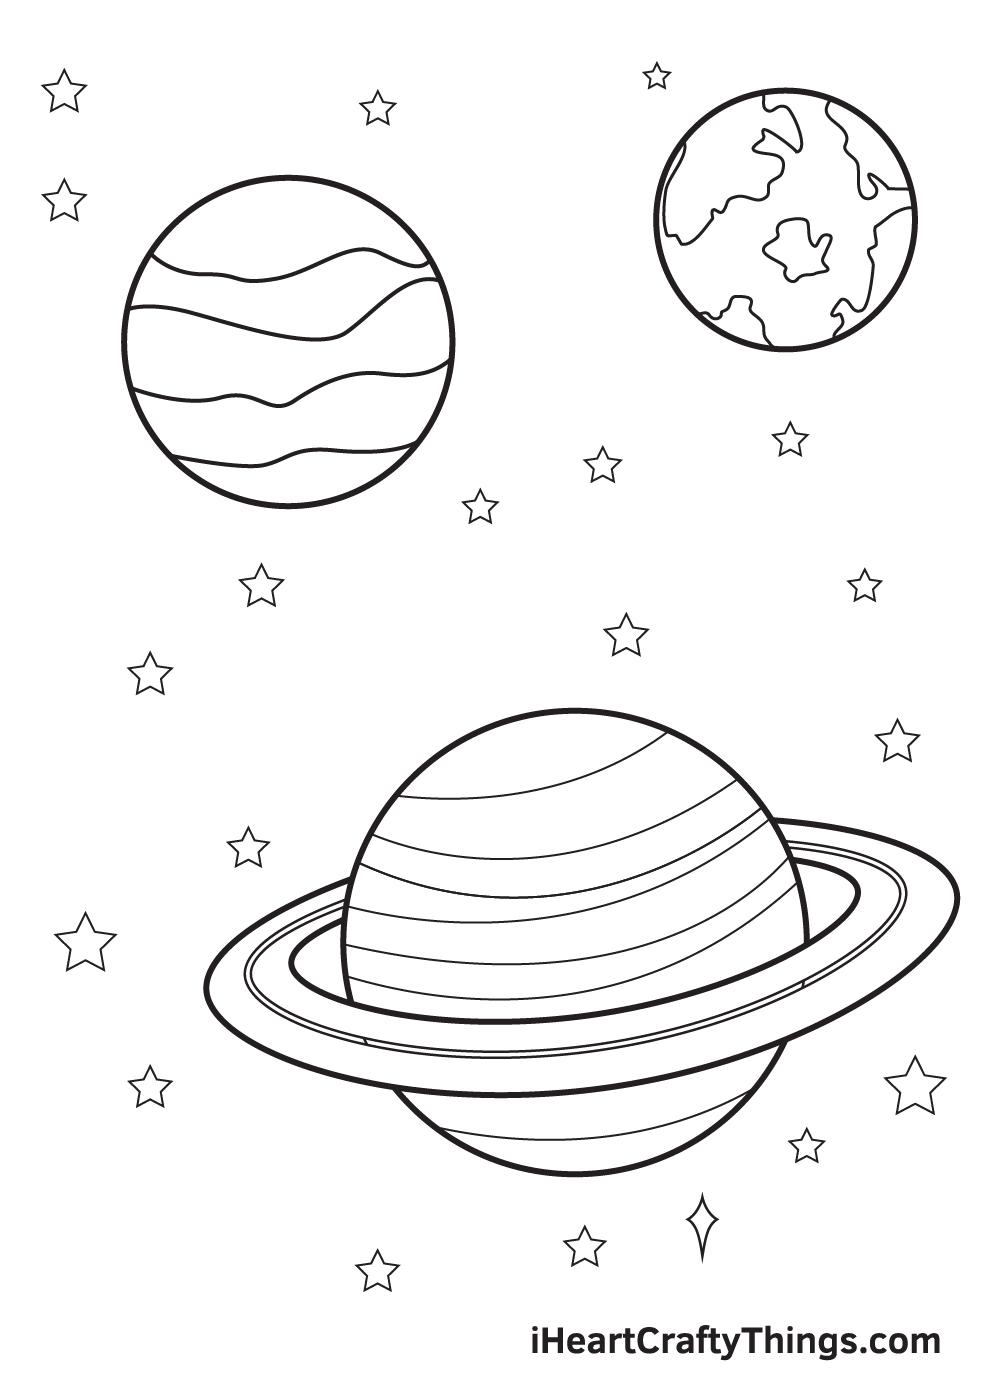 galaxy drawing - step 8